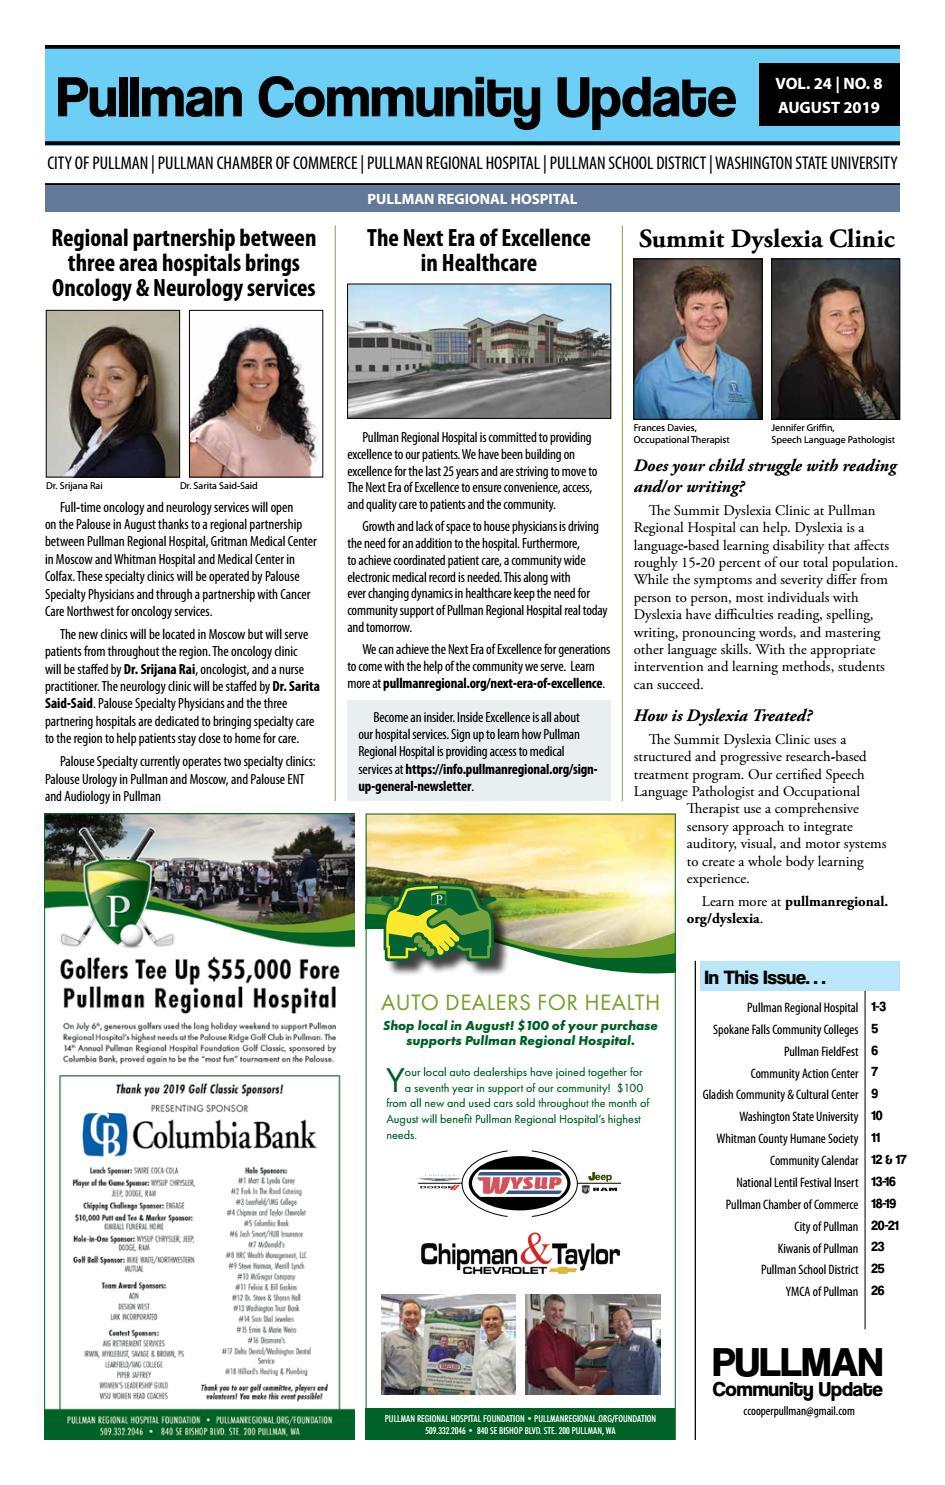 Pullman Community Update August 2019 by Hannah Crawford - issuu